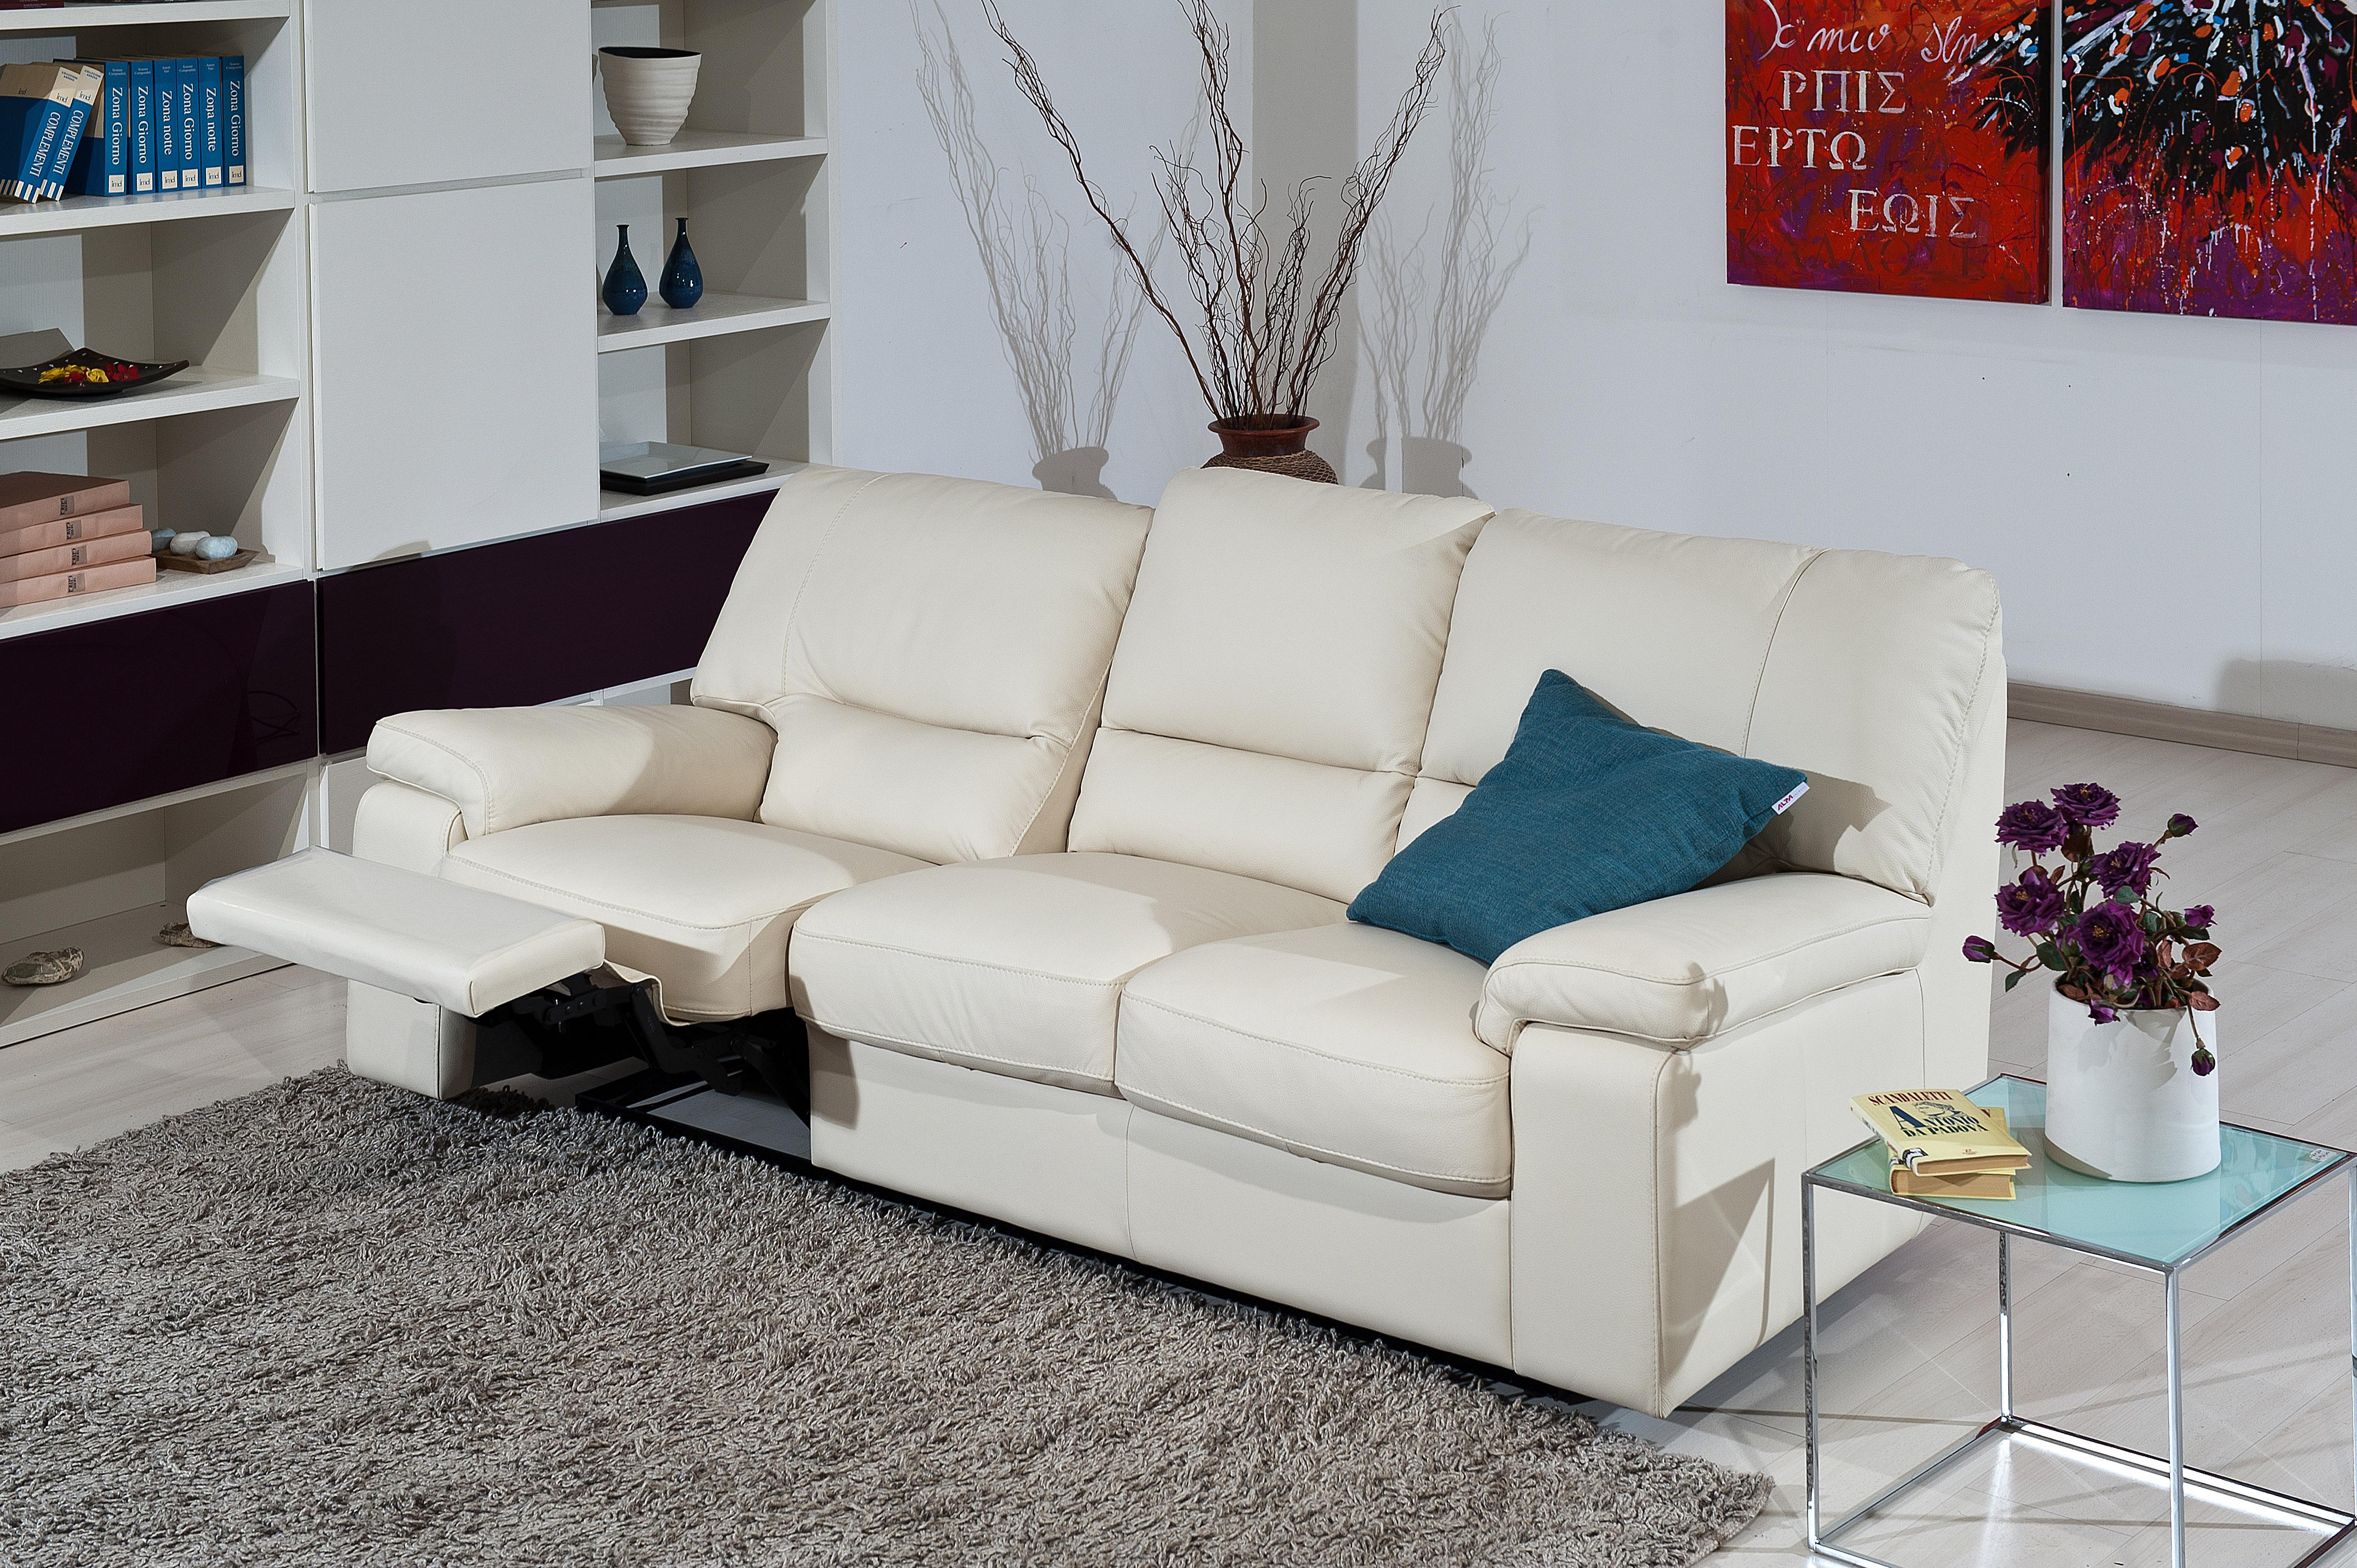 Luxor Italian Leather Sofa Set With Sliding Seats Baltimore Maryland Antonio Salotti Dony